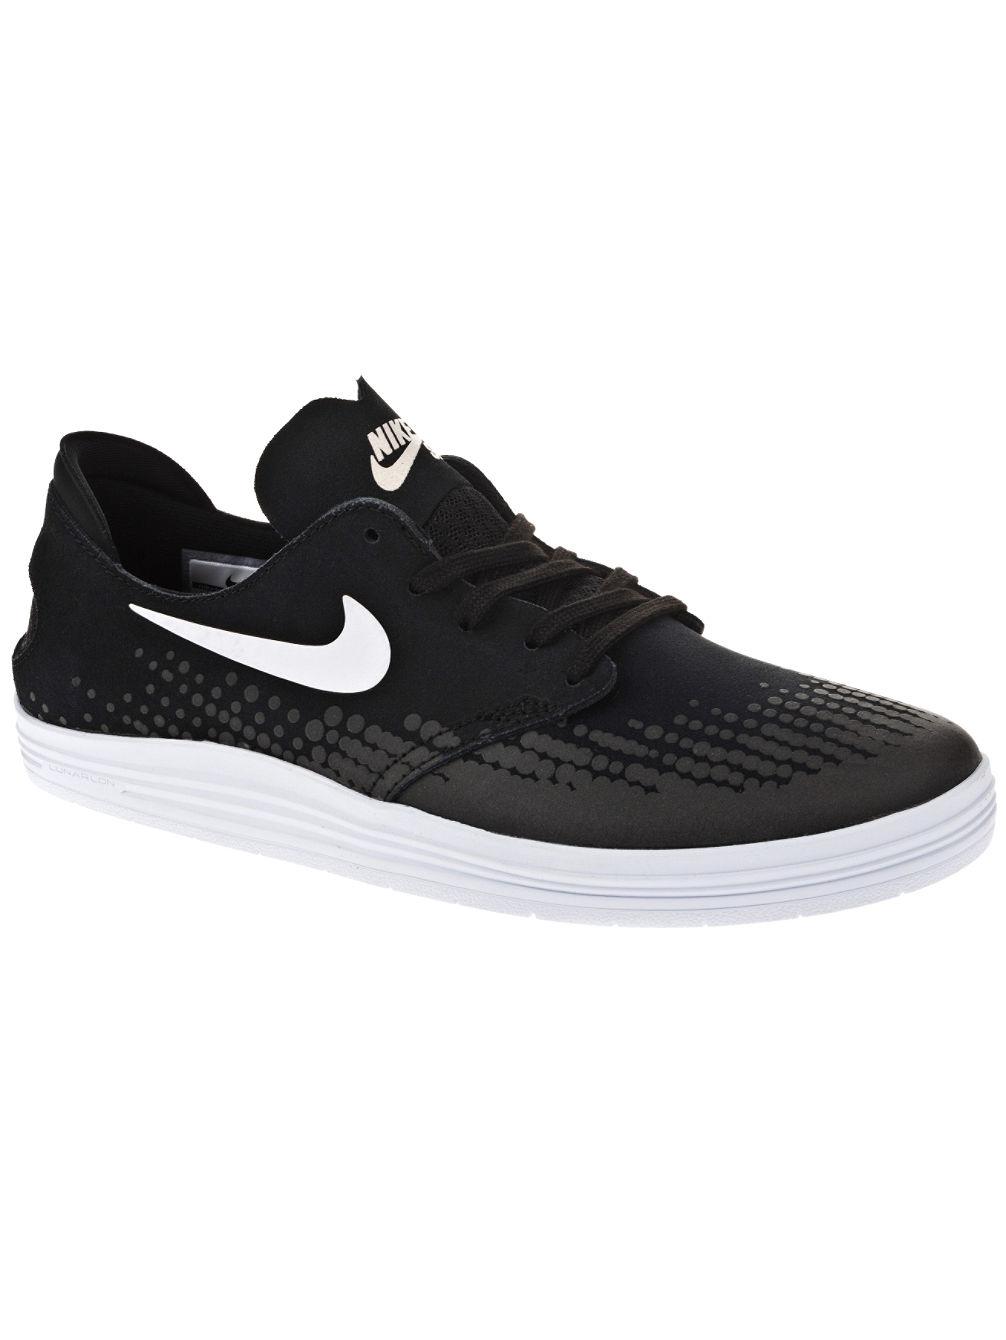 Nike Lunar Oneshot Skate Shoes - nike - blue-tomato.com